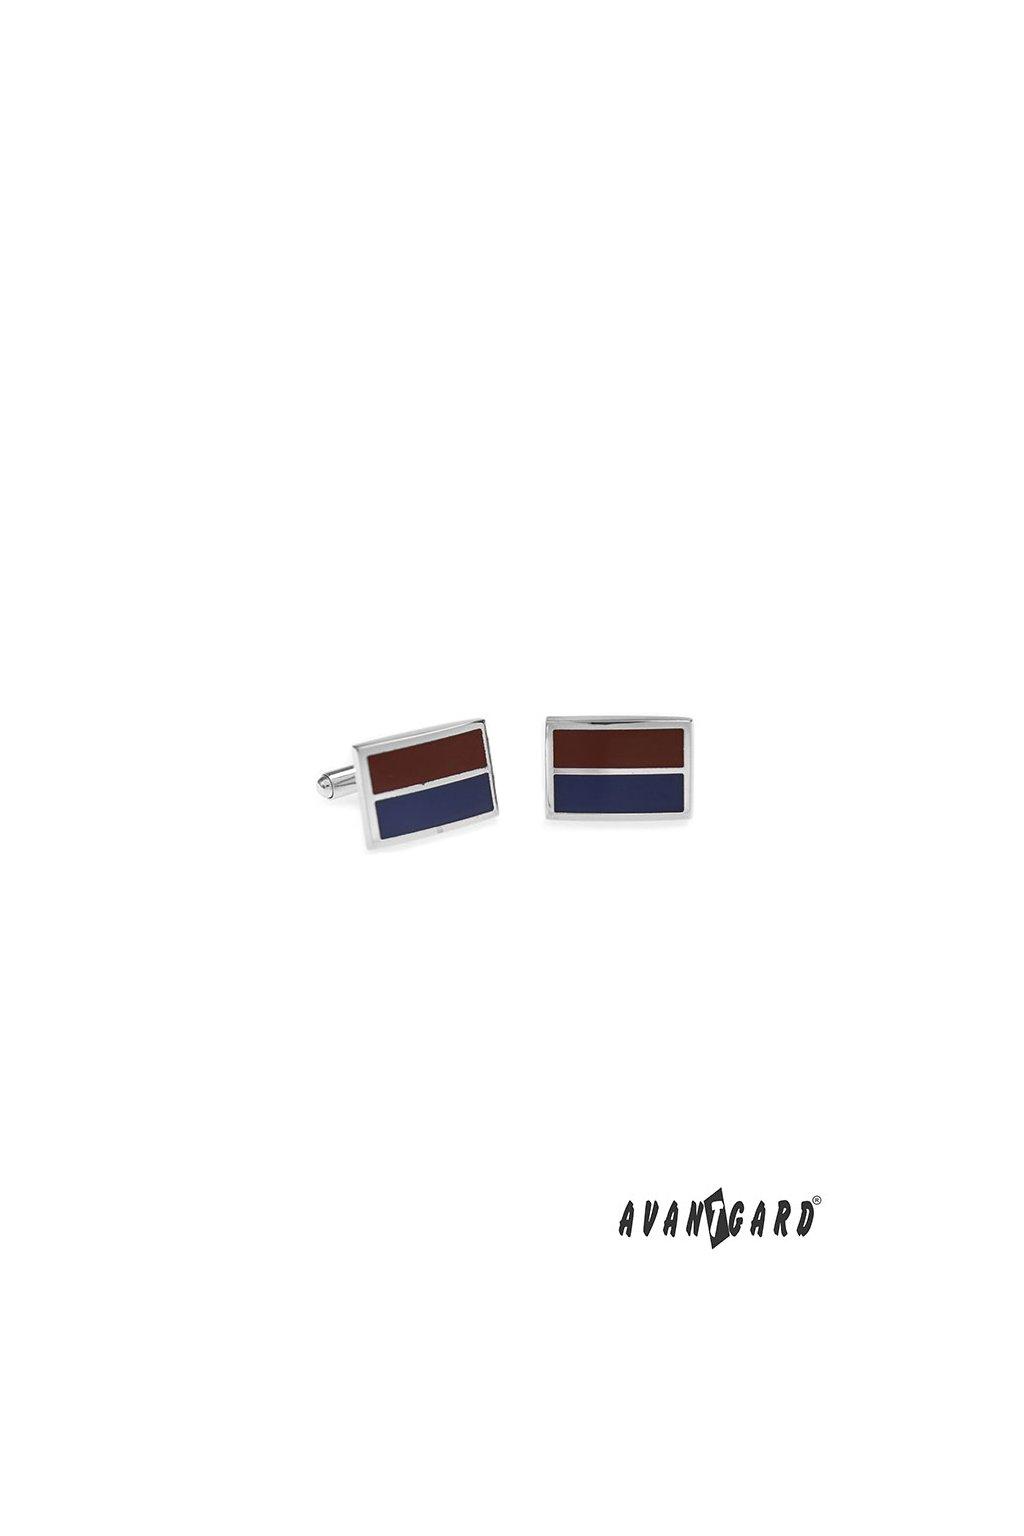 Manžetové knoflíčky PREMIUM, 573-20717, Stříbrná lesk/modrá